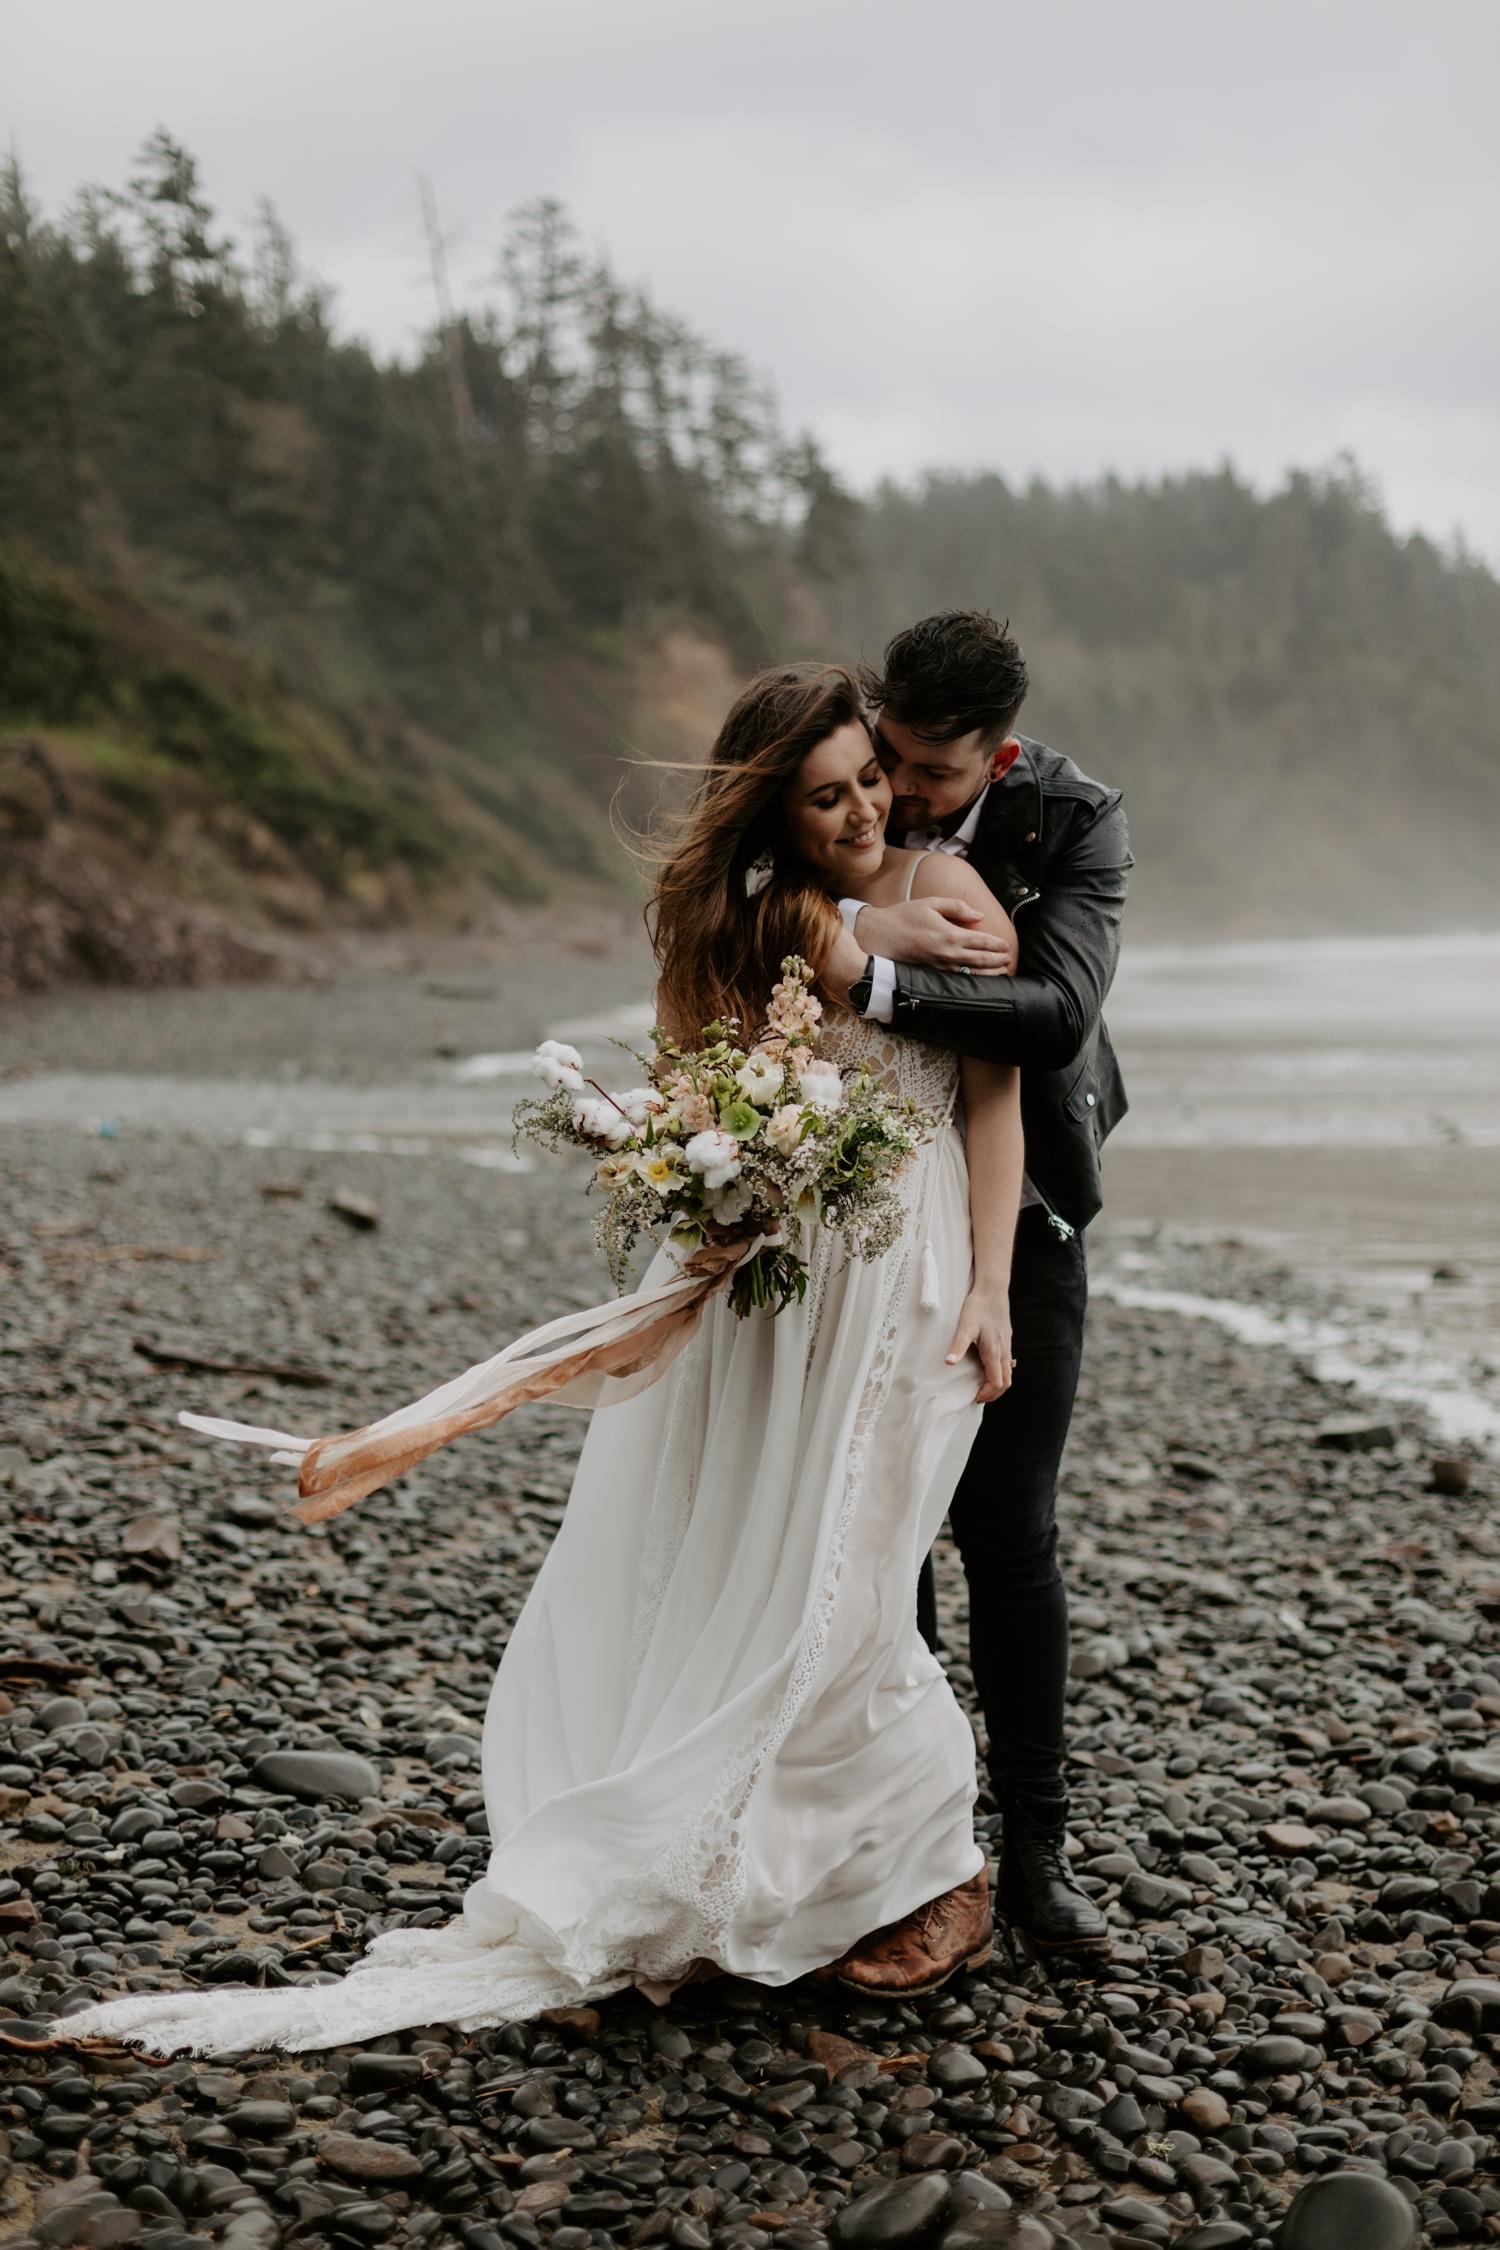 intimate-oregon-coast-elopement-2018-04-26_0010.jpg